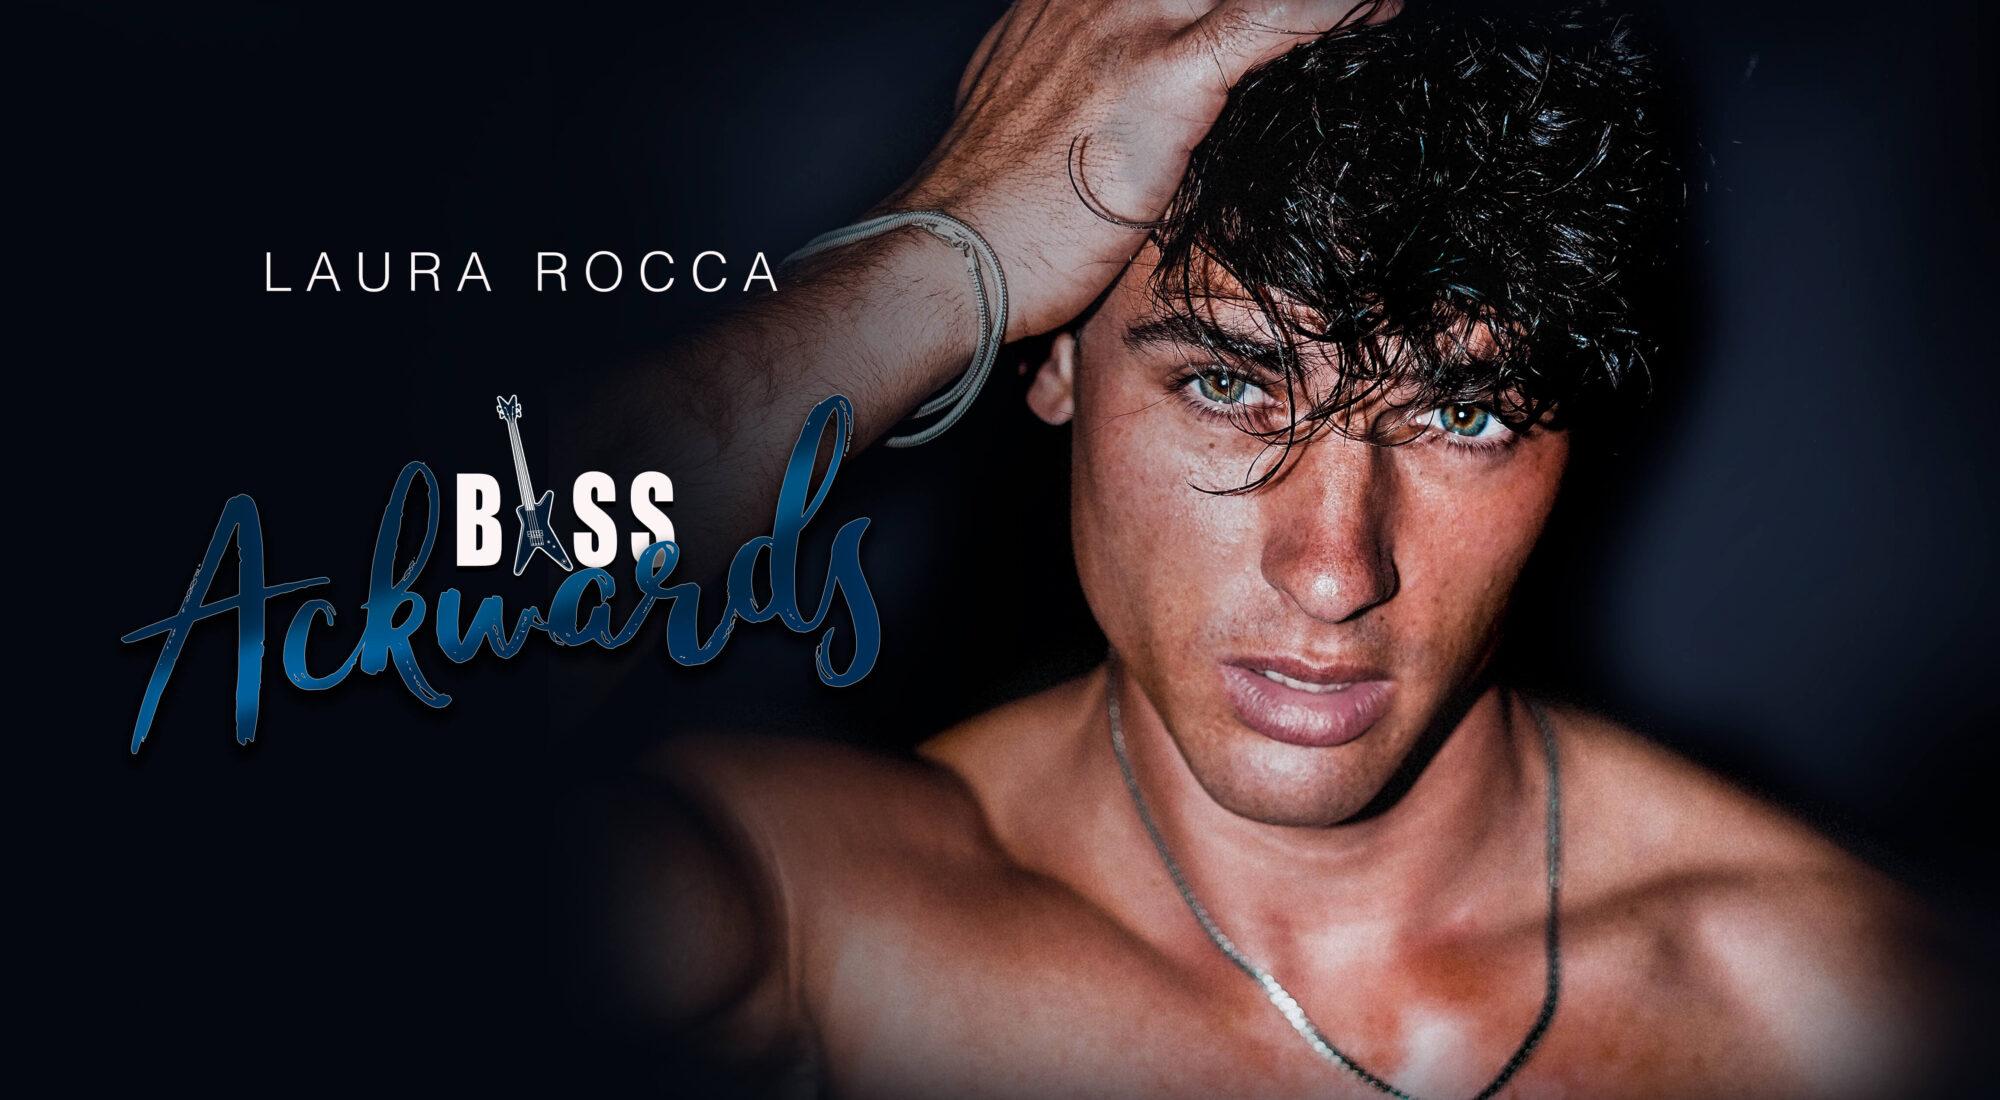 Bass-Ackwards di Laura Rocca